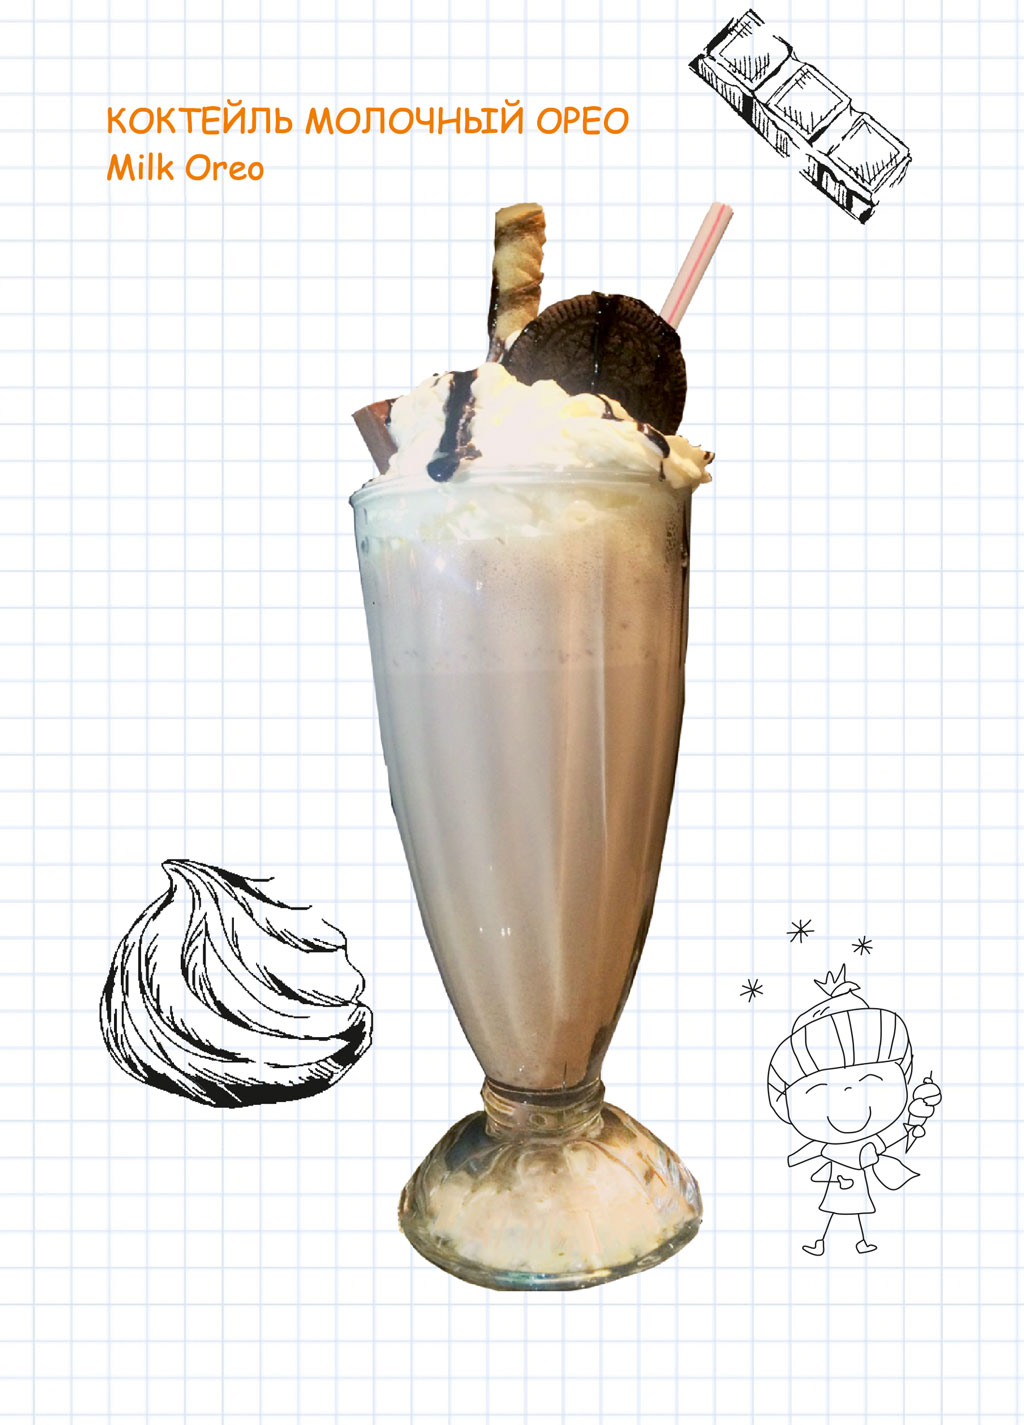 Коктейль молочный Орео (Milk shake Oreo) в ресторане Аннам Брахма в Оренбурге